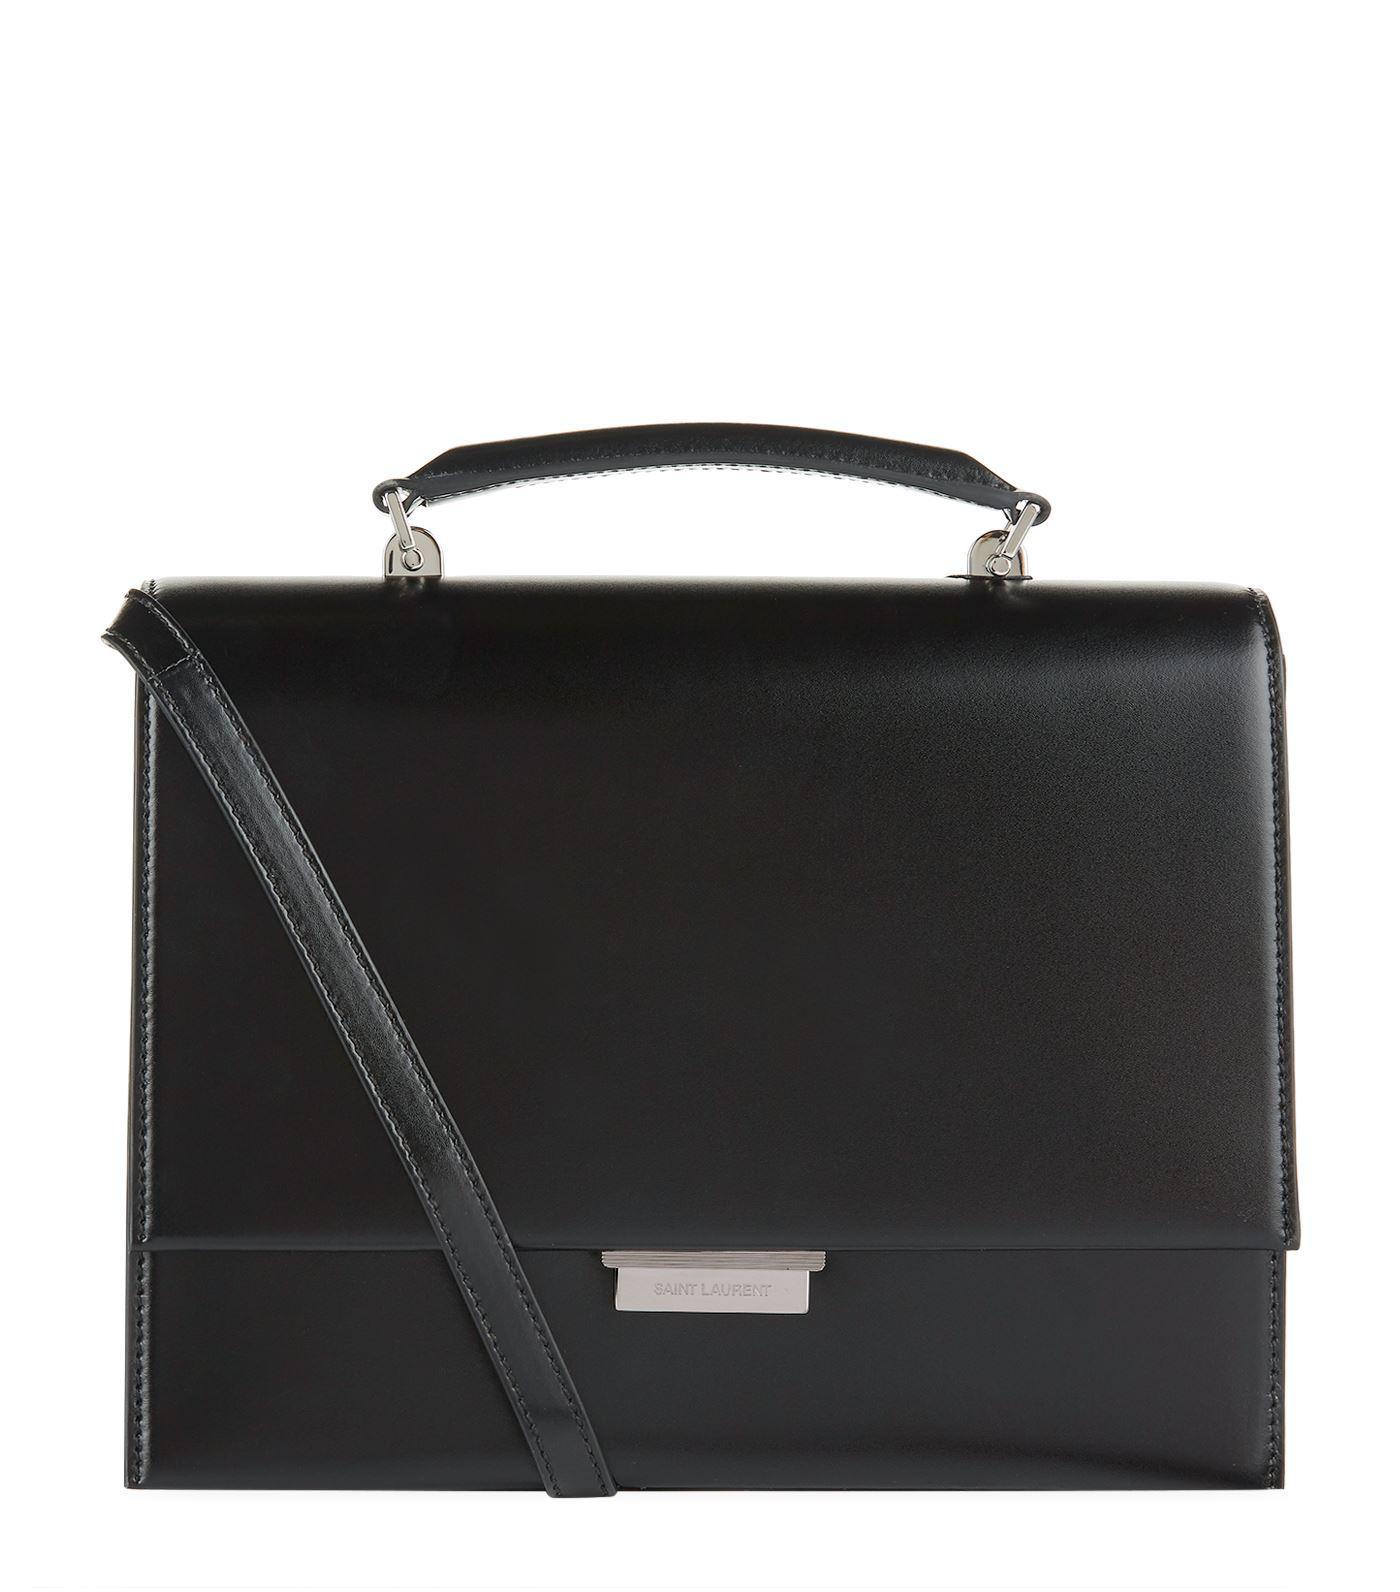 Saint Laurent Pre-owned - Babylone leather bag C8uxURLAuU